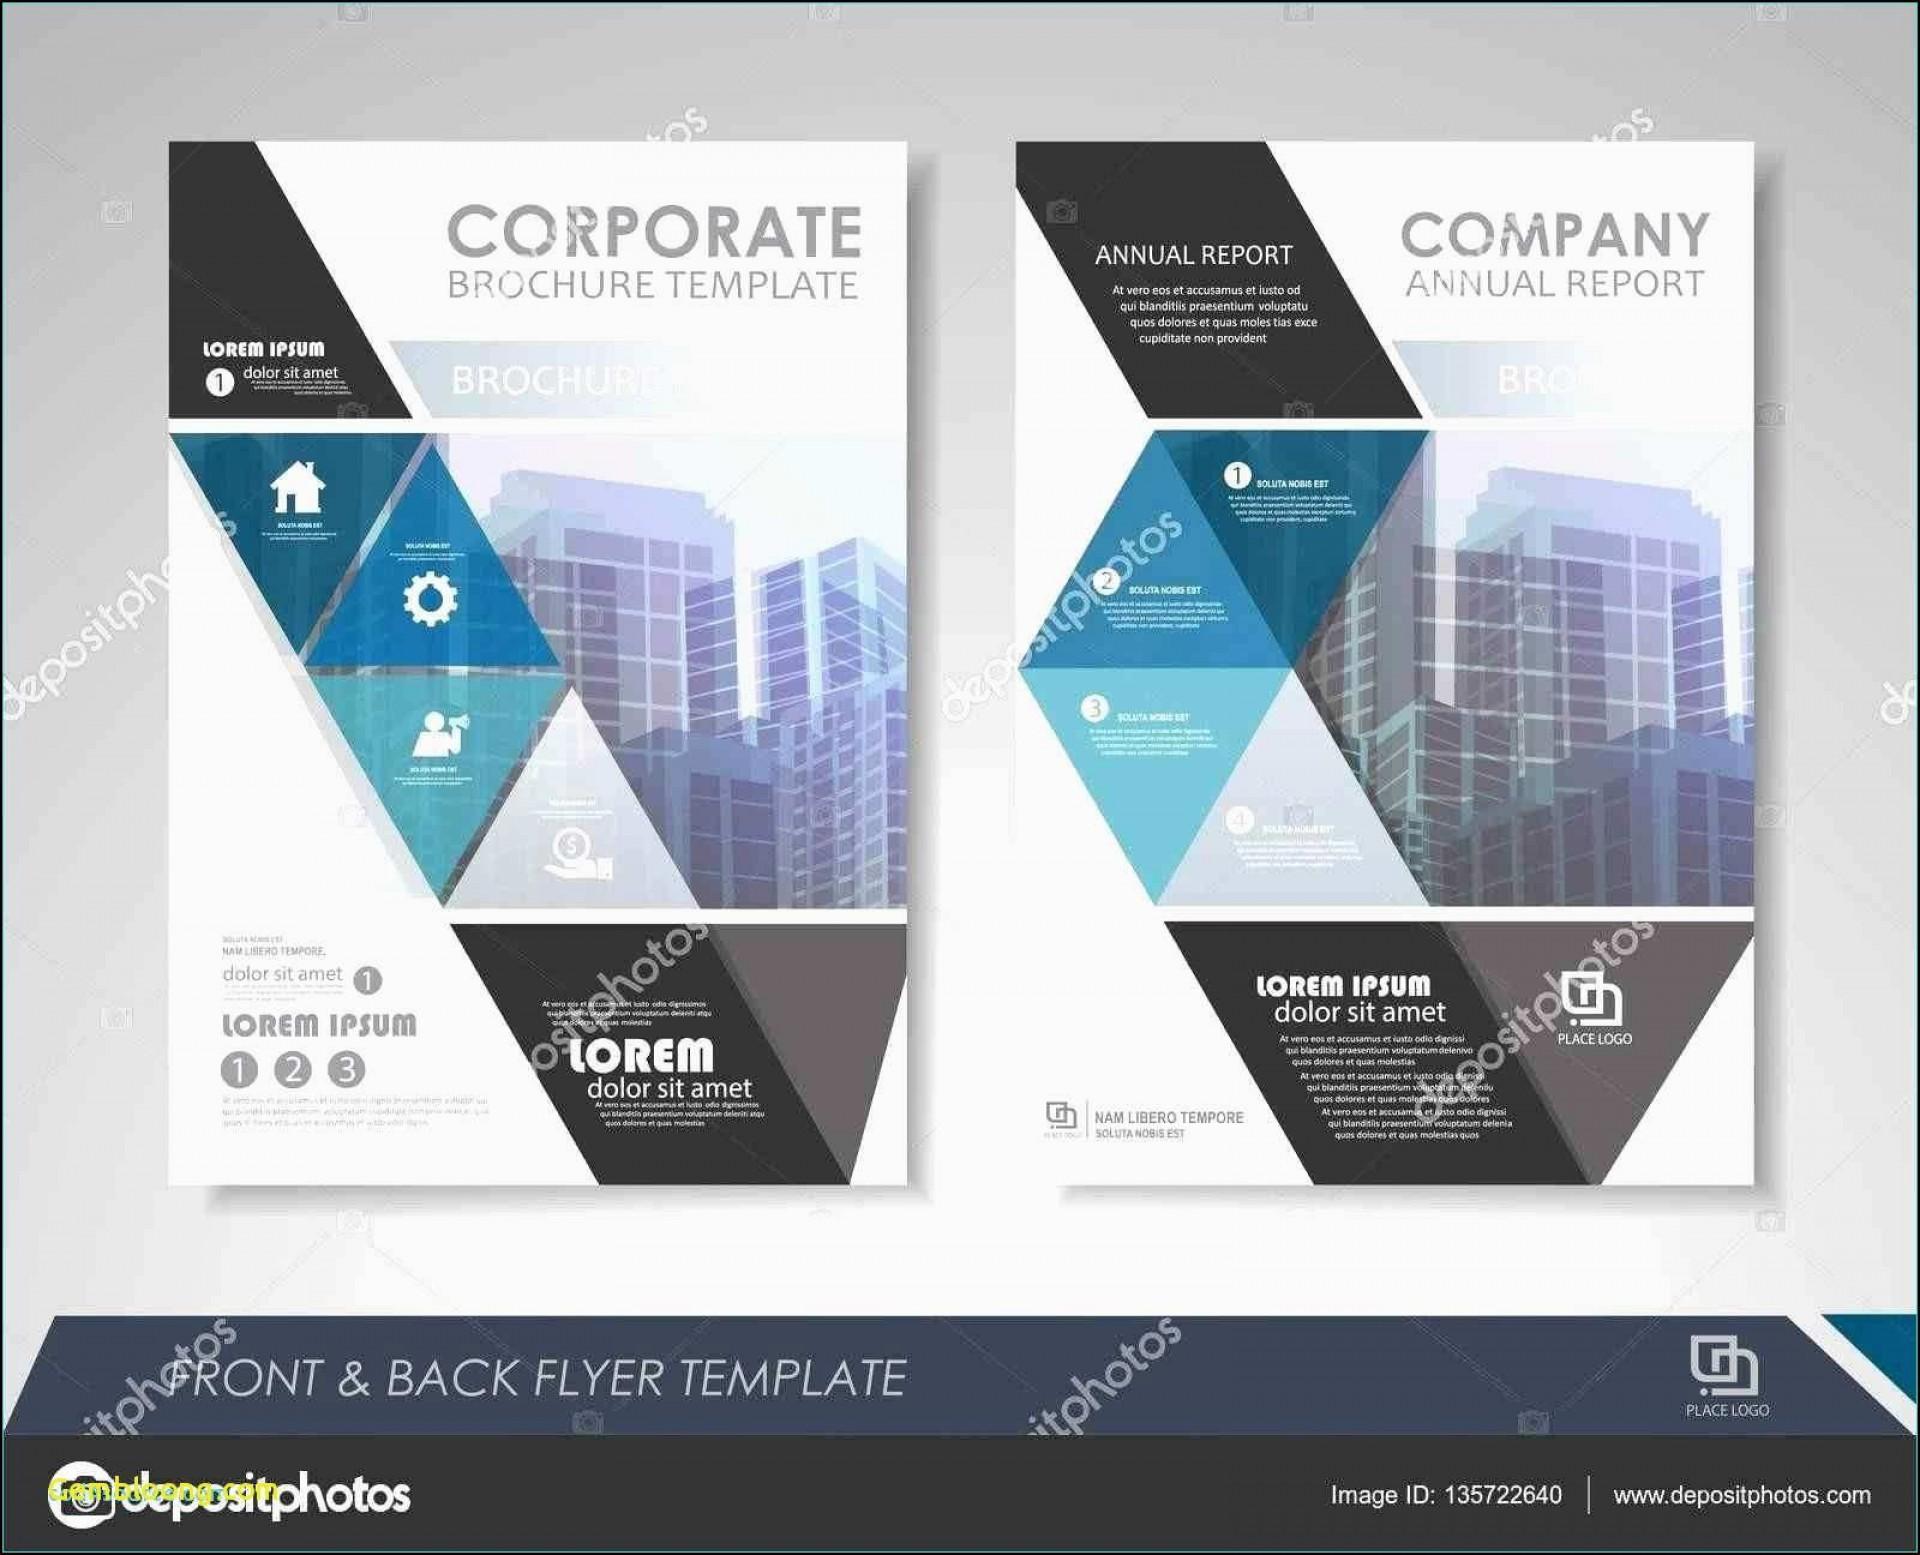 002 Simple Corporate Brochure Design Template Psd Free Download Highest Clarity  Tri Fold Hotel1920